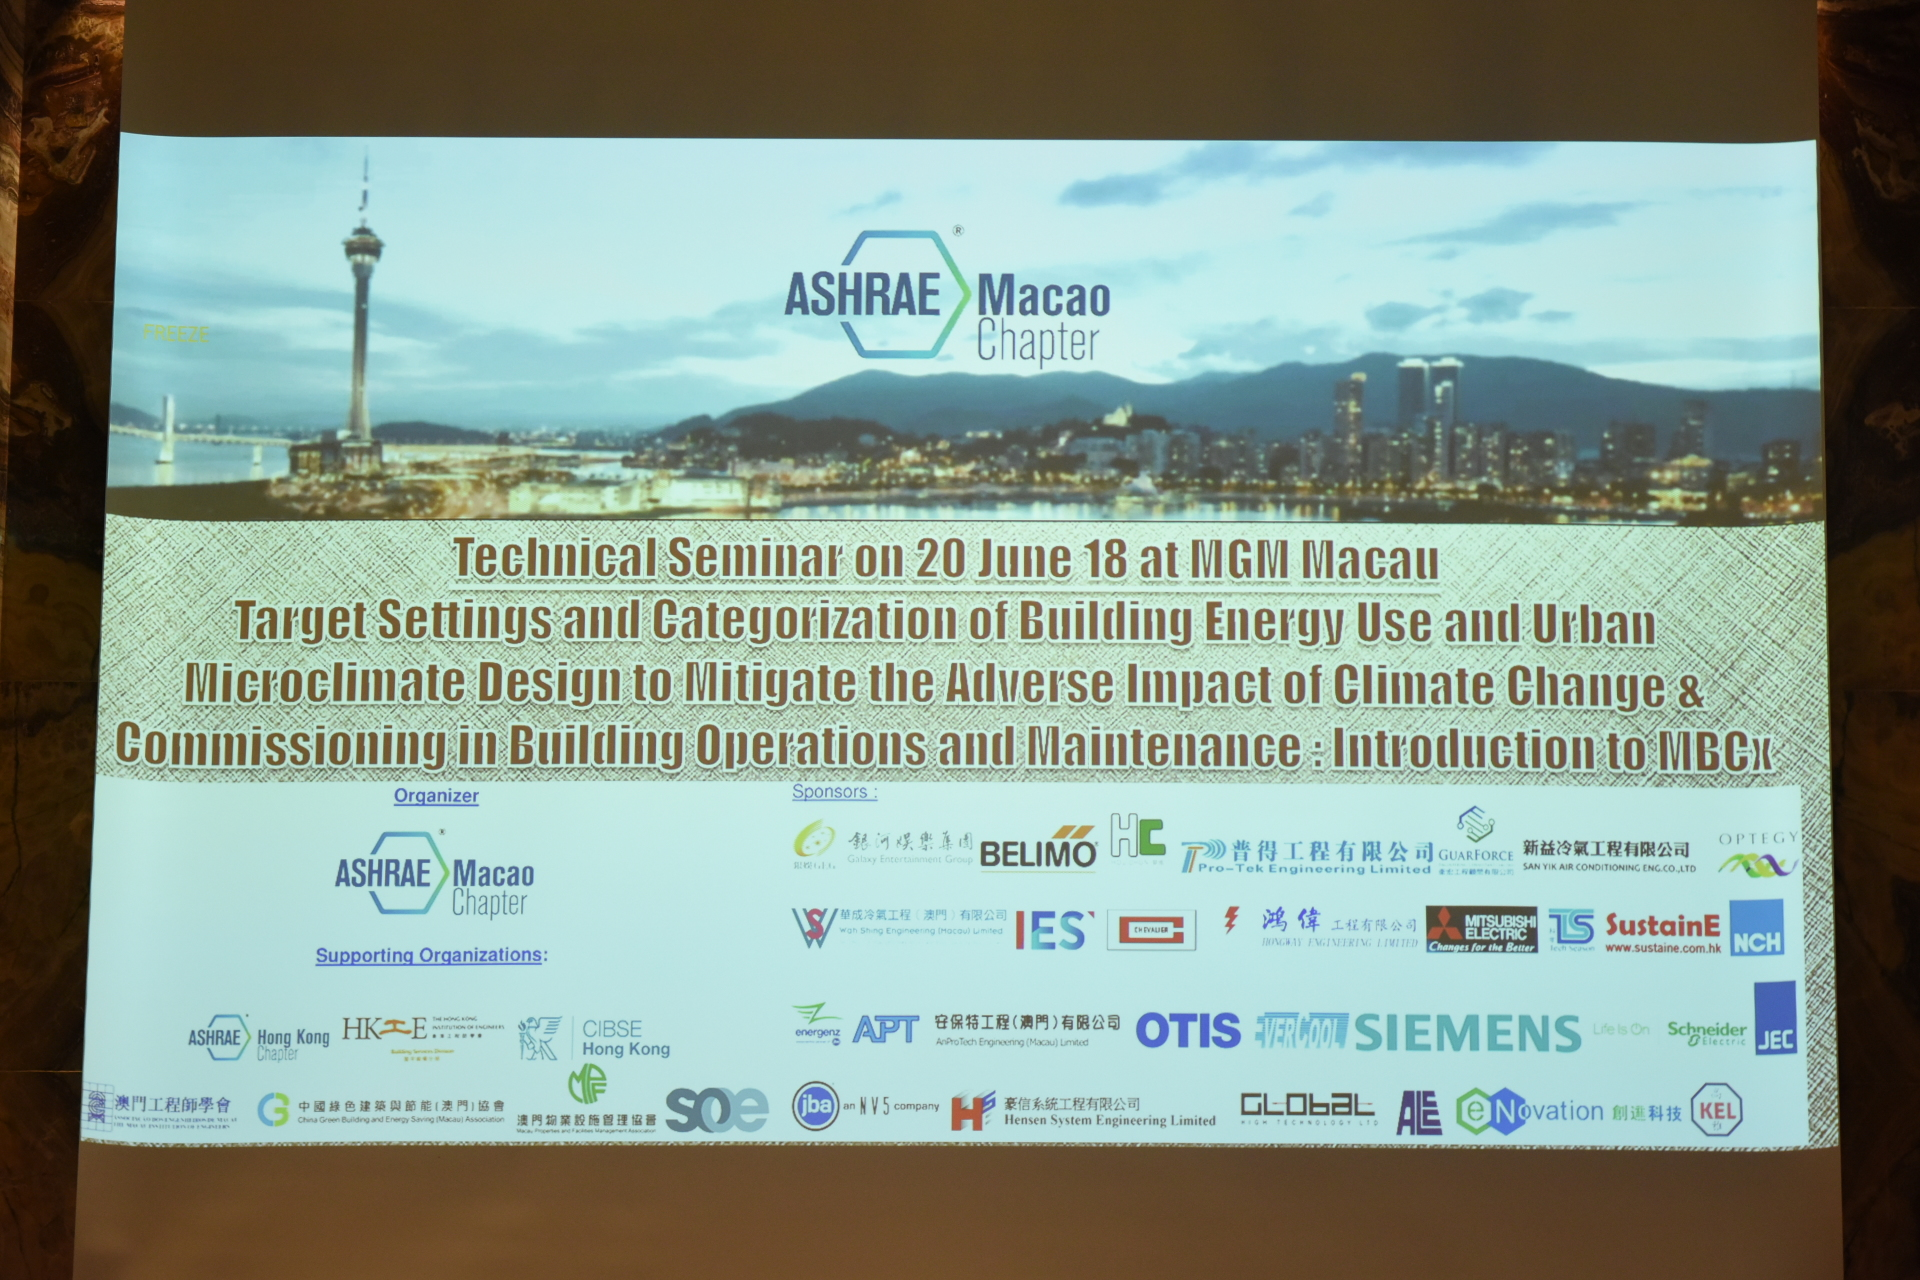 ASHRAE-Macao Technical Seminar